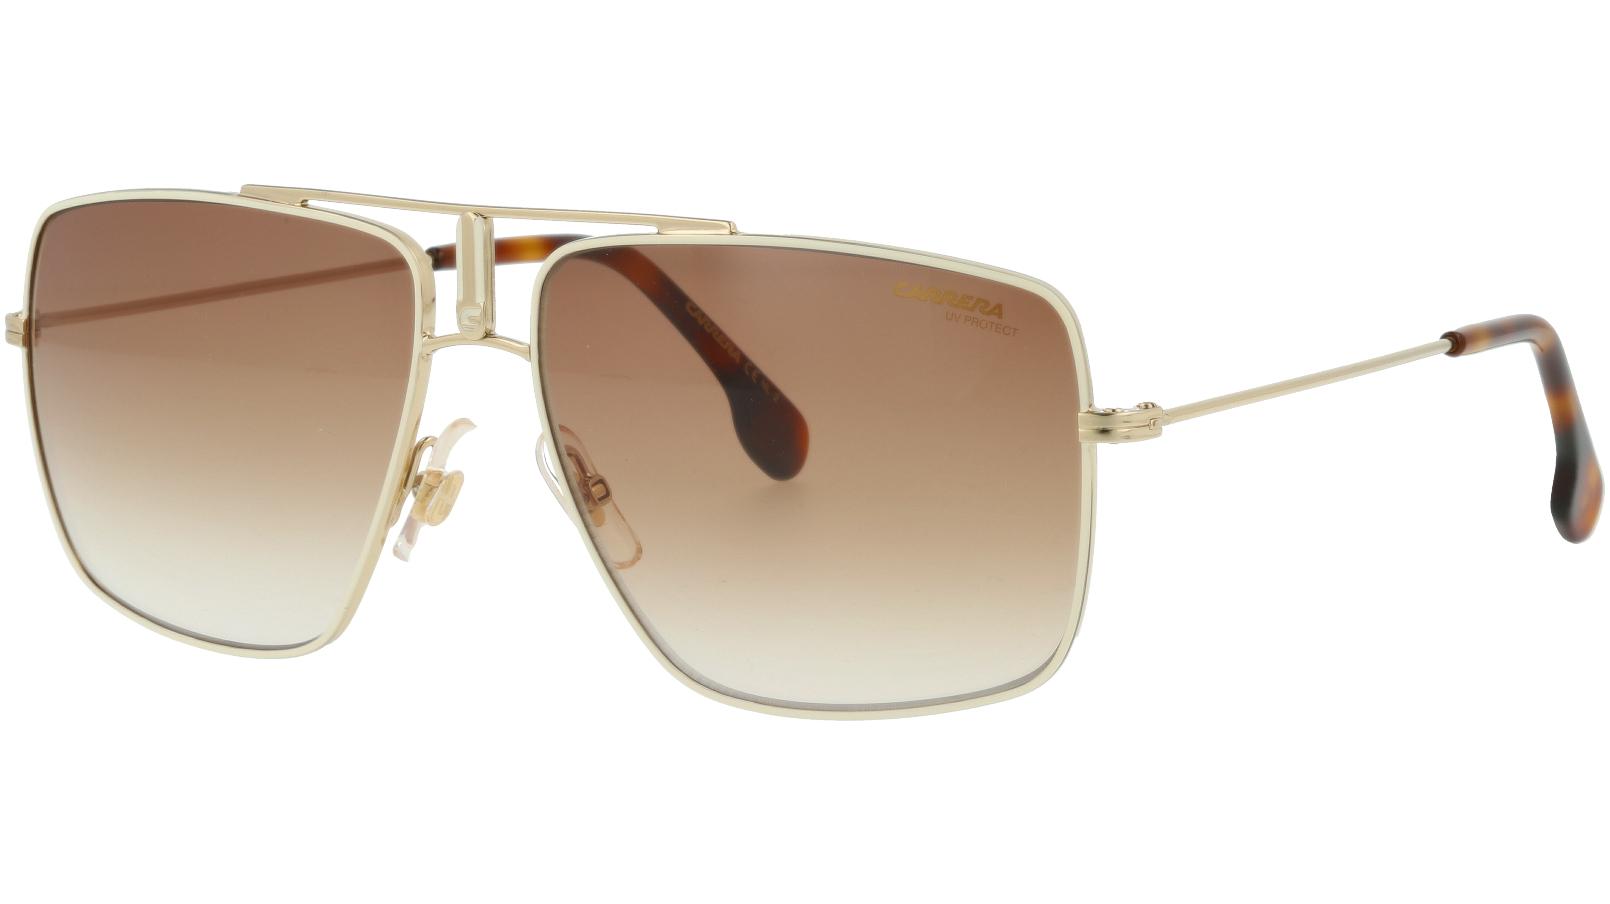 CARRERA CARRERA 1006/S 9HTHA 60 BLACK Sunglasses